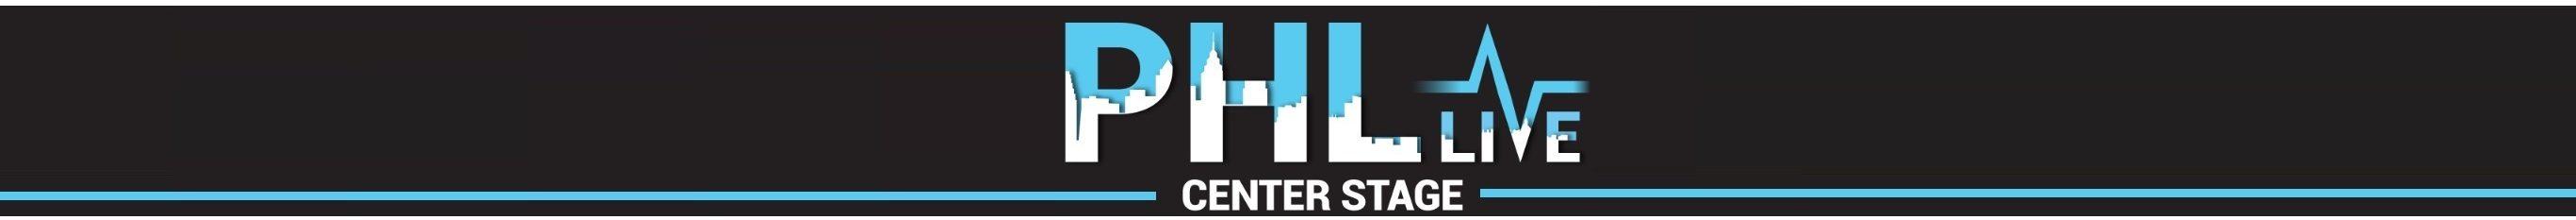 PHL LIVE Center Stage